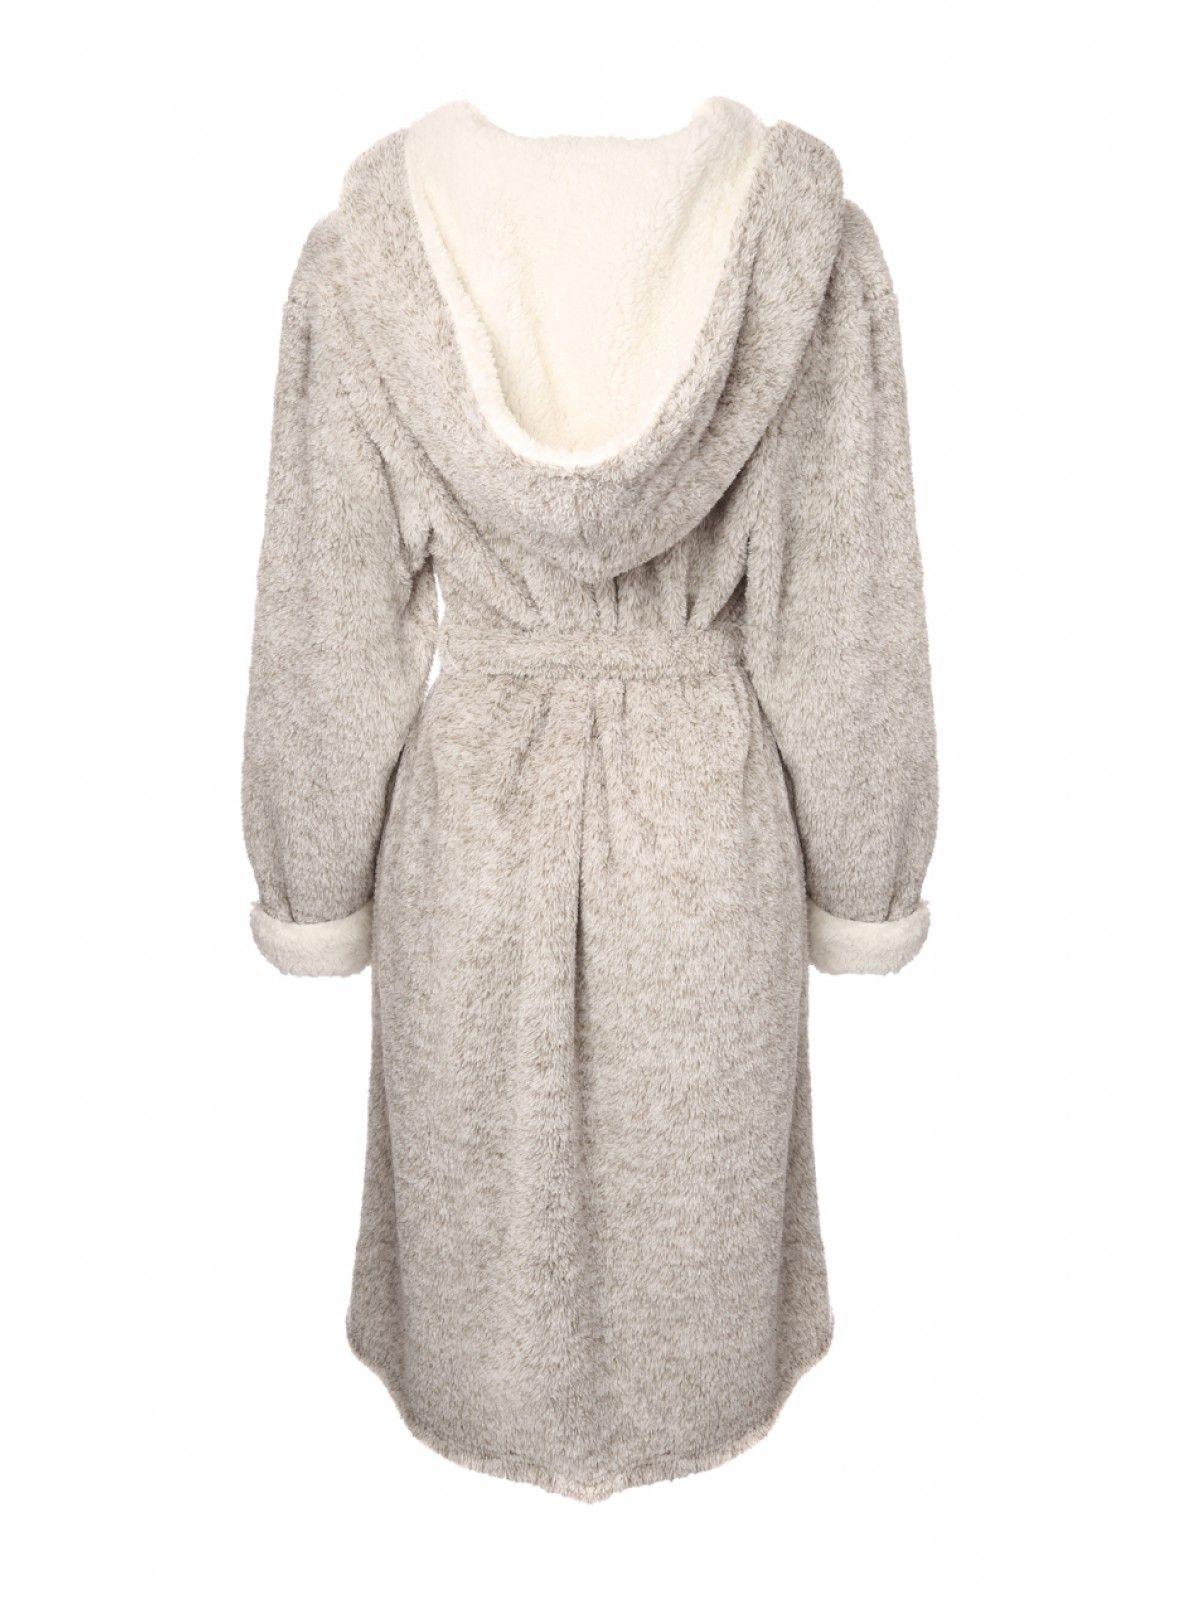 "This super soft and fluffy <a href=""/womens/nightwear/dressing ..."